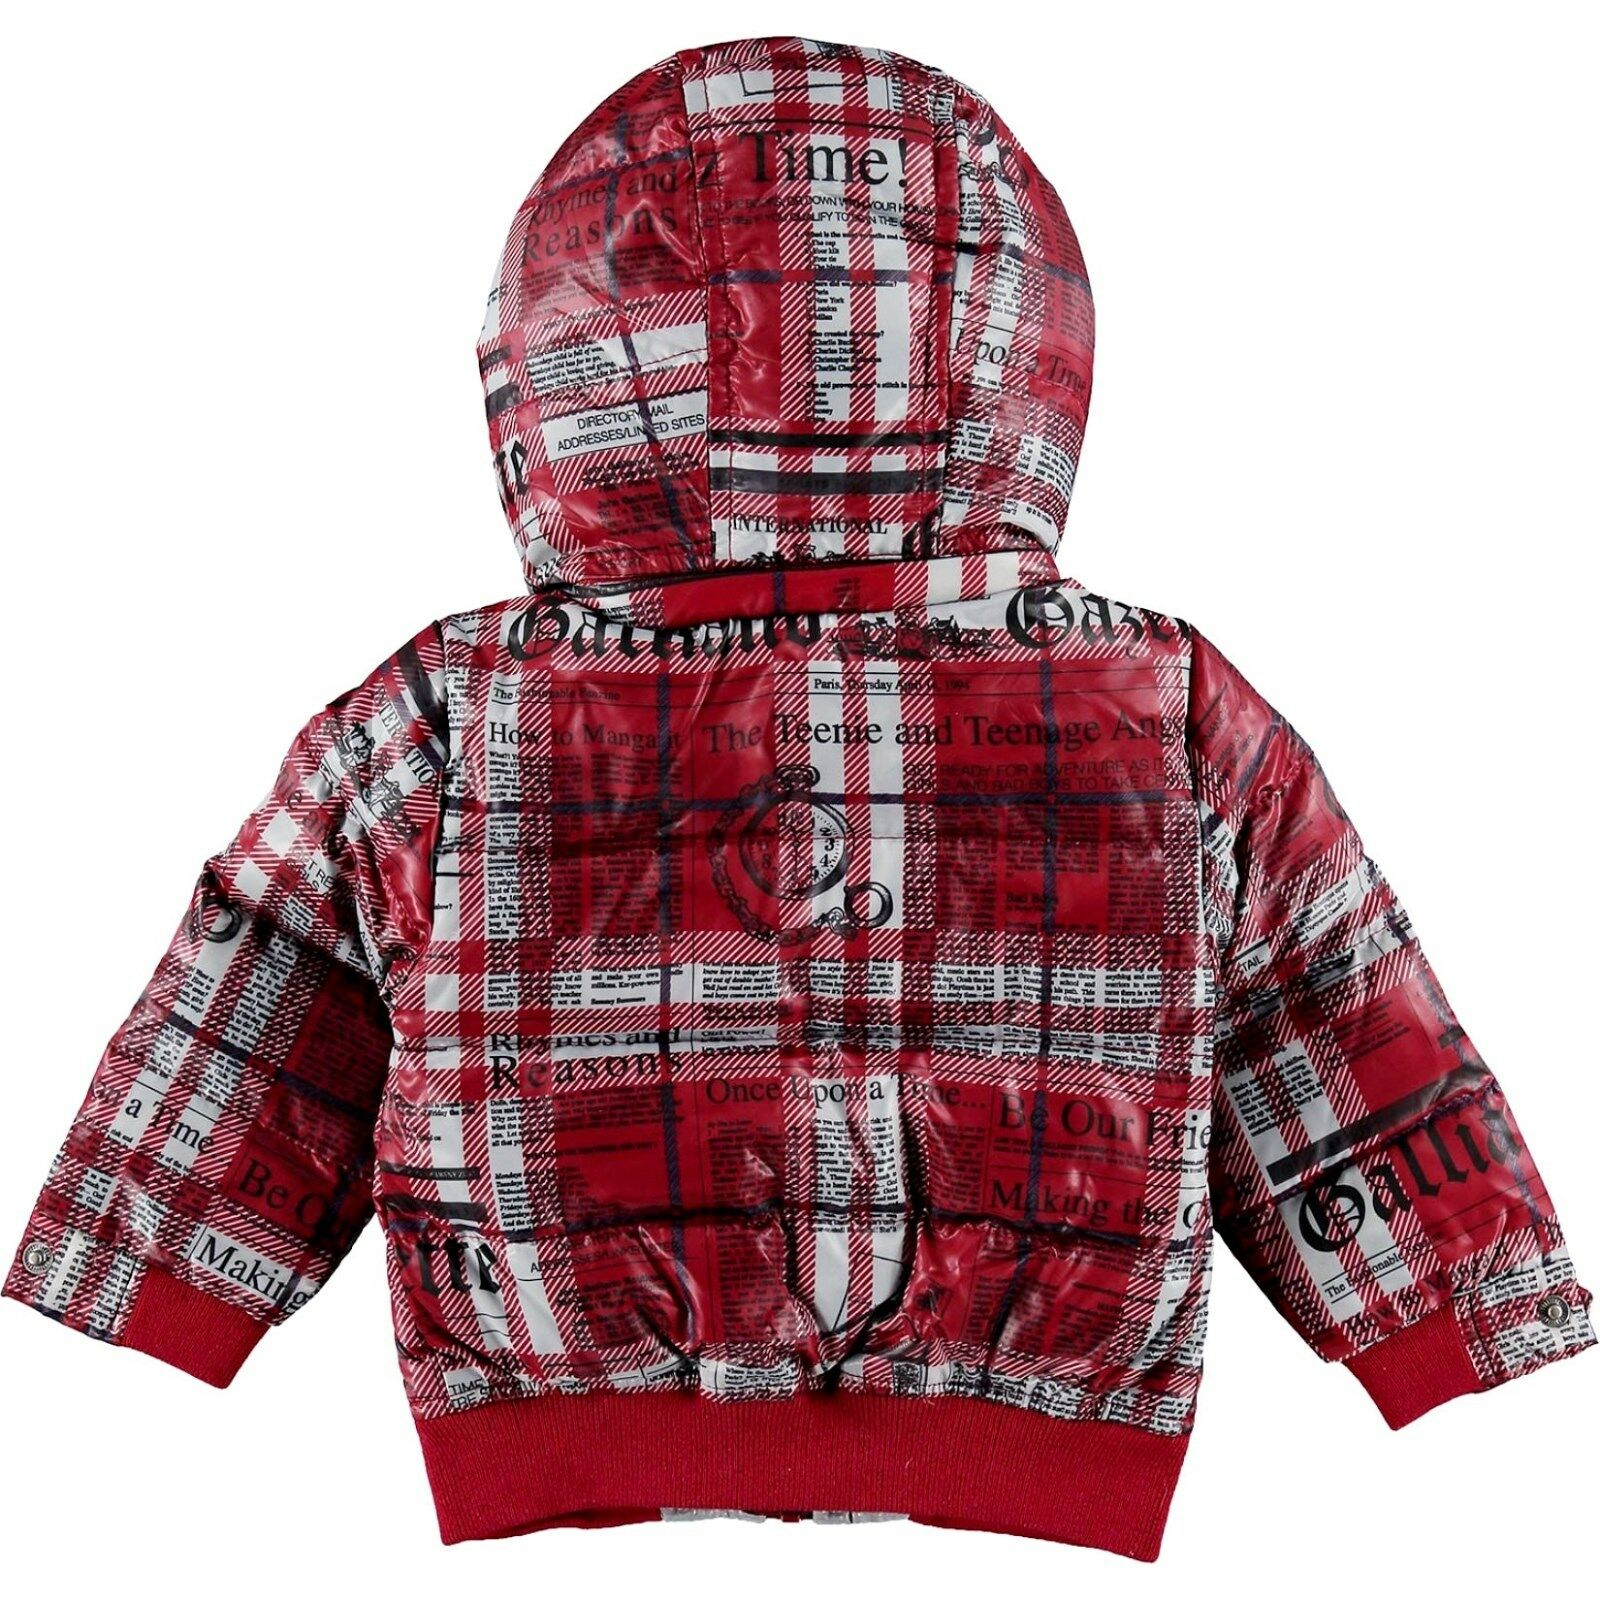 e4b1fb09d346 John Galliano Baby Boy Duck Down Insulated Jacket Storm Hood 6 9m ...